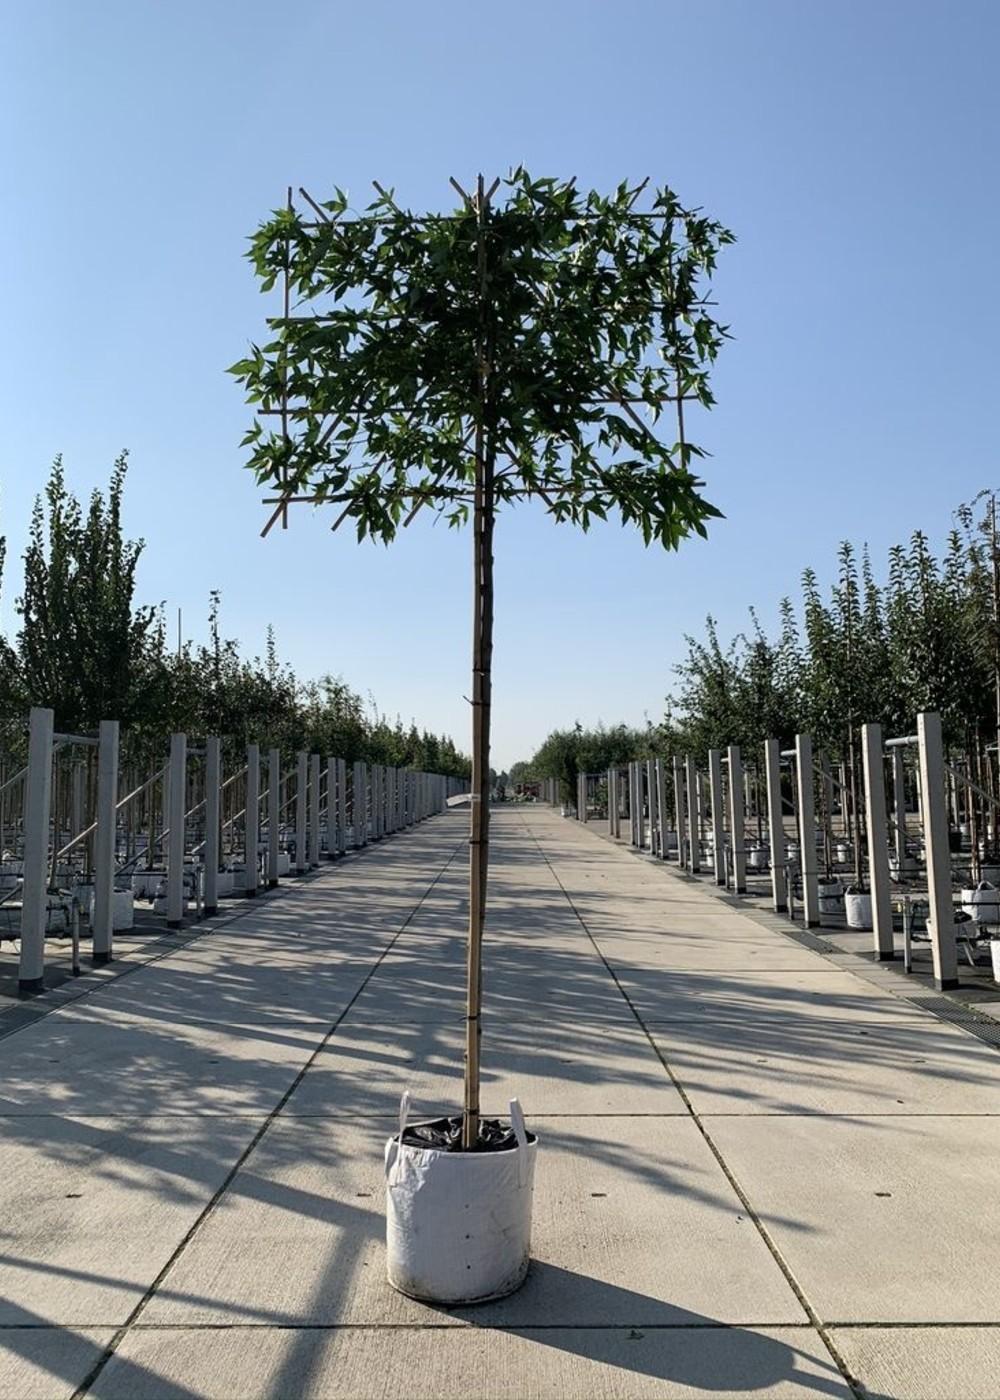 Amberbaum Worplesdon Spalierbaum | Liquidambar styraciflua 'Worplesdon' Spalierbaum